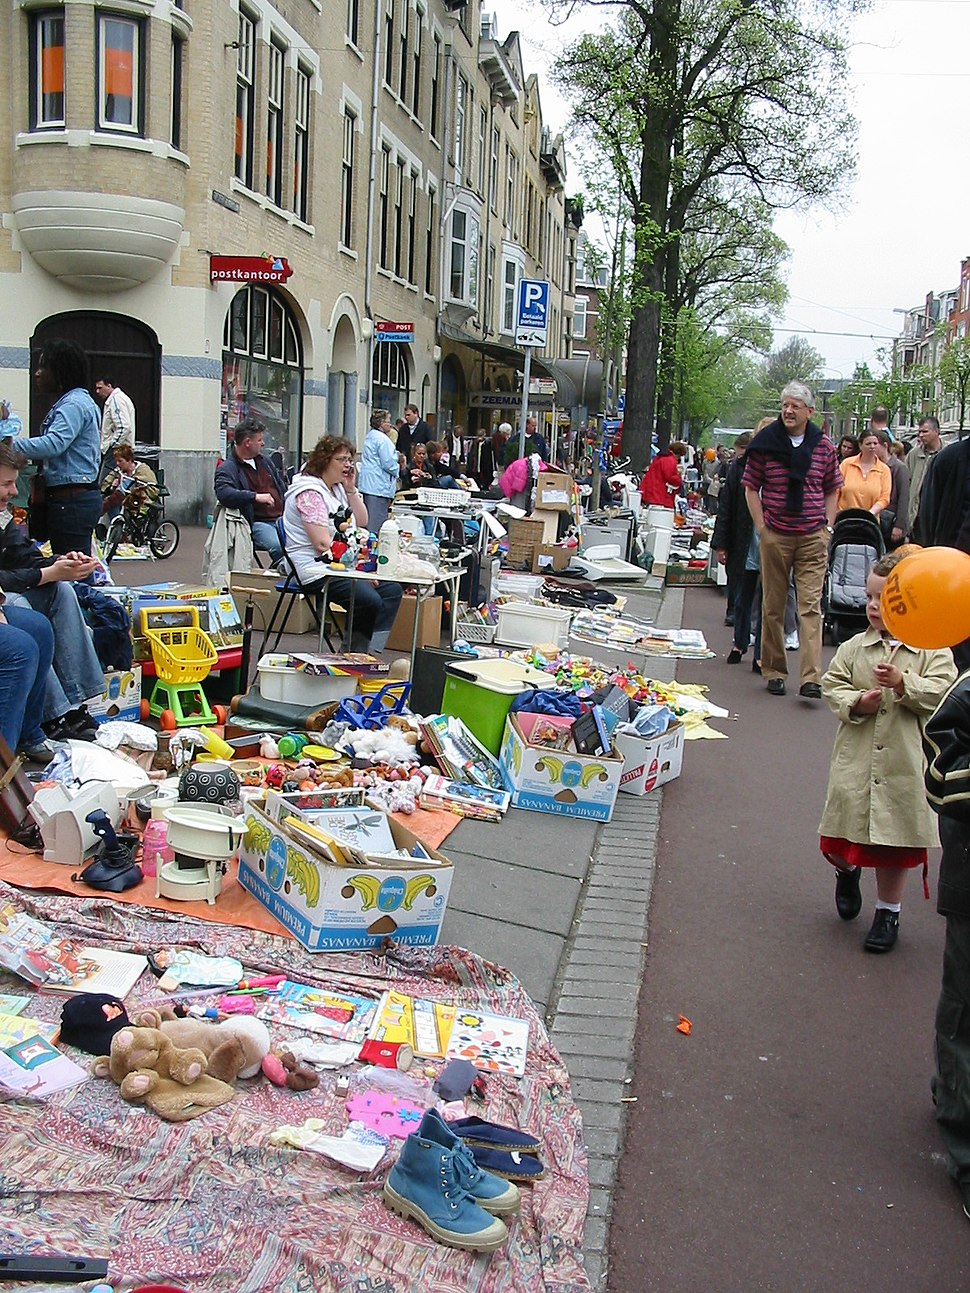 Vrijmarkt Den Haag Koninginnedag 30 april 2005 versie 2